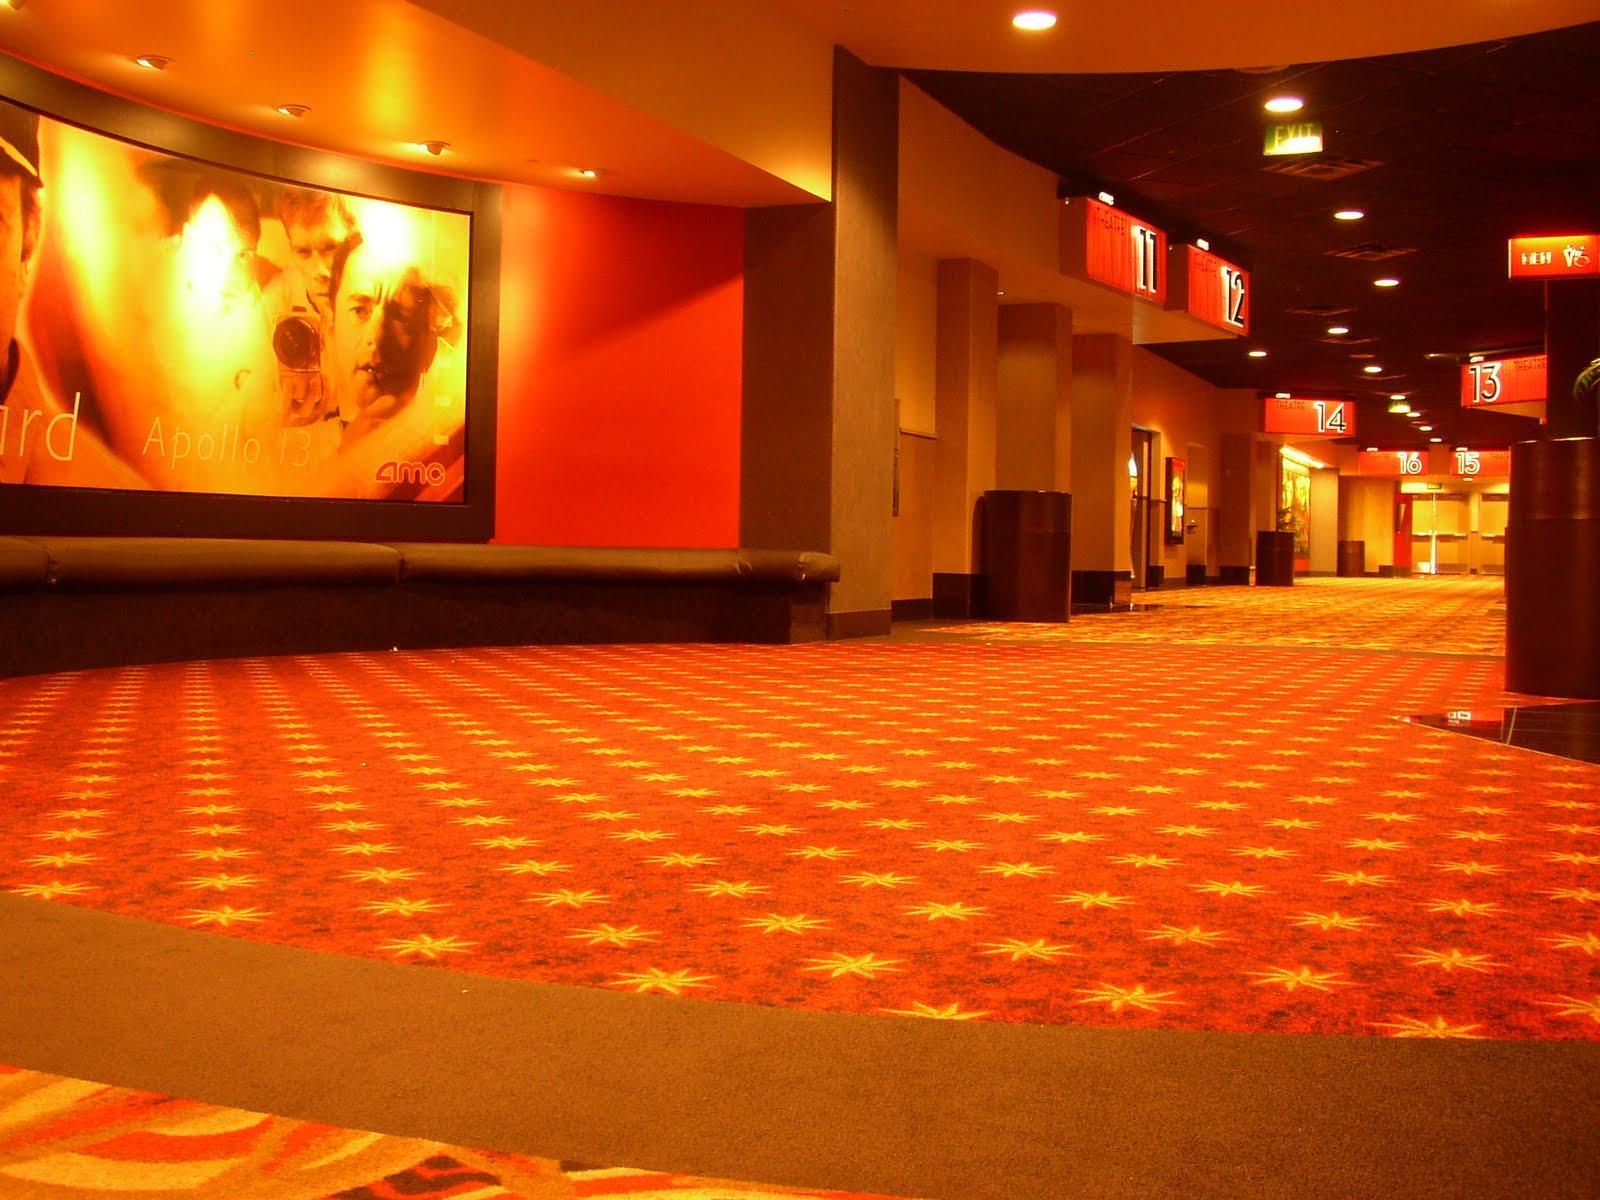 Back of theater chairs - Movie Theater Lobby Displays Amc Theater Hallways Often